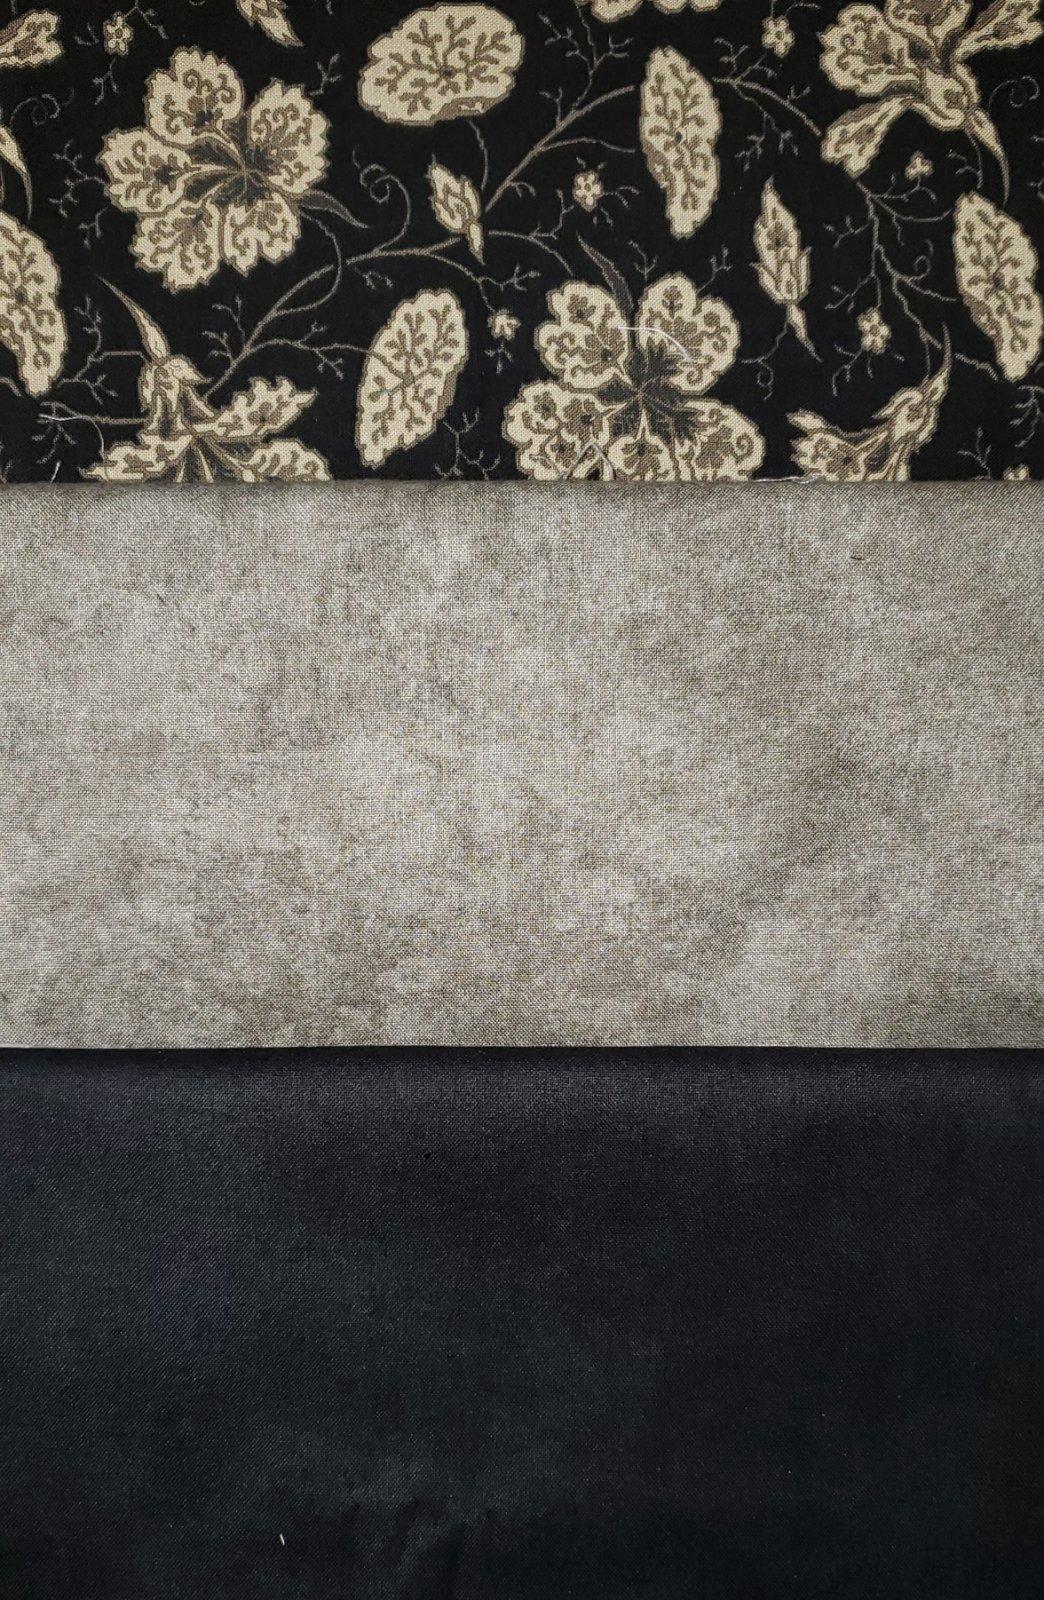 Klondike - Villa Rosa QUILT KIT - Black/Grey/Floral - 48 x 64